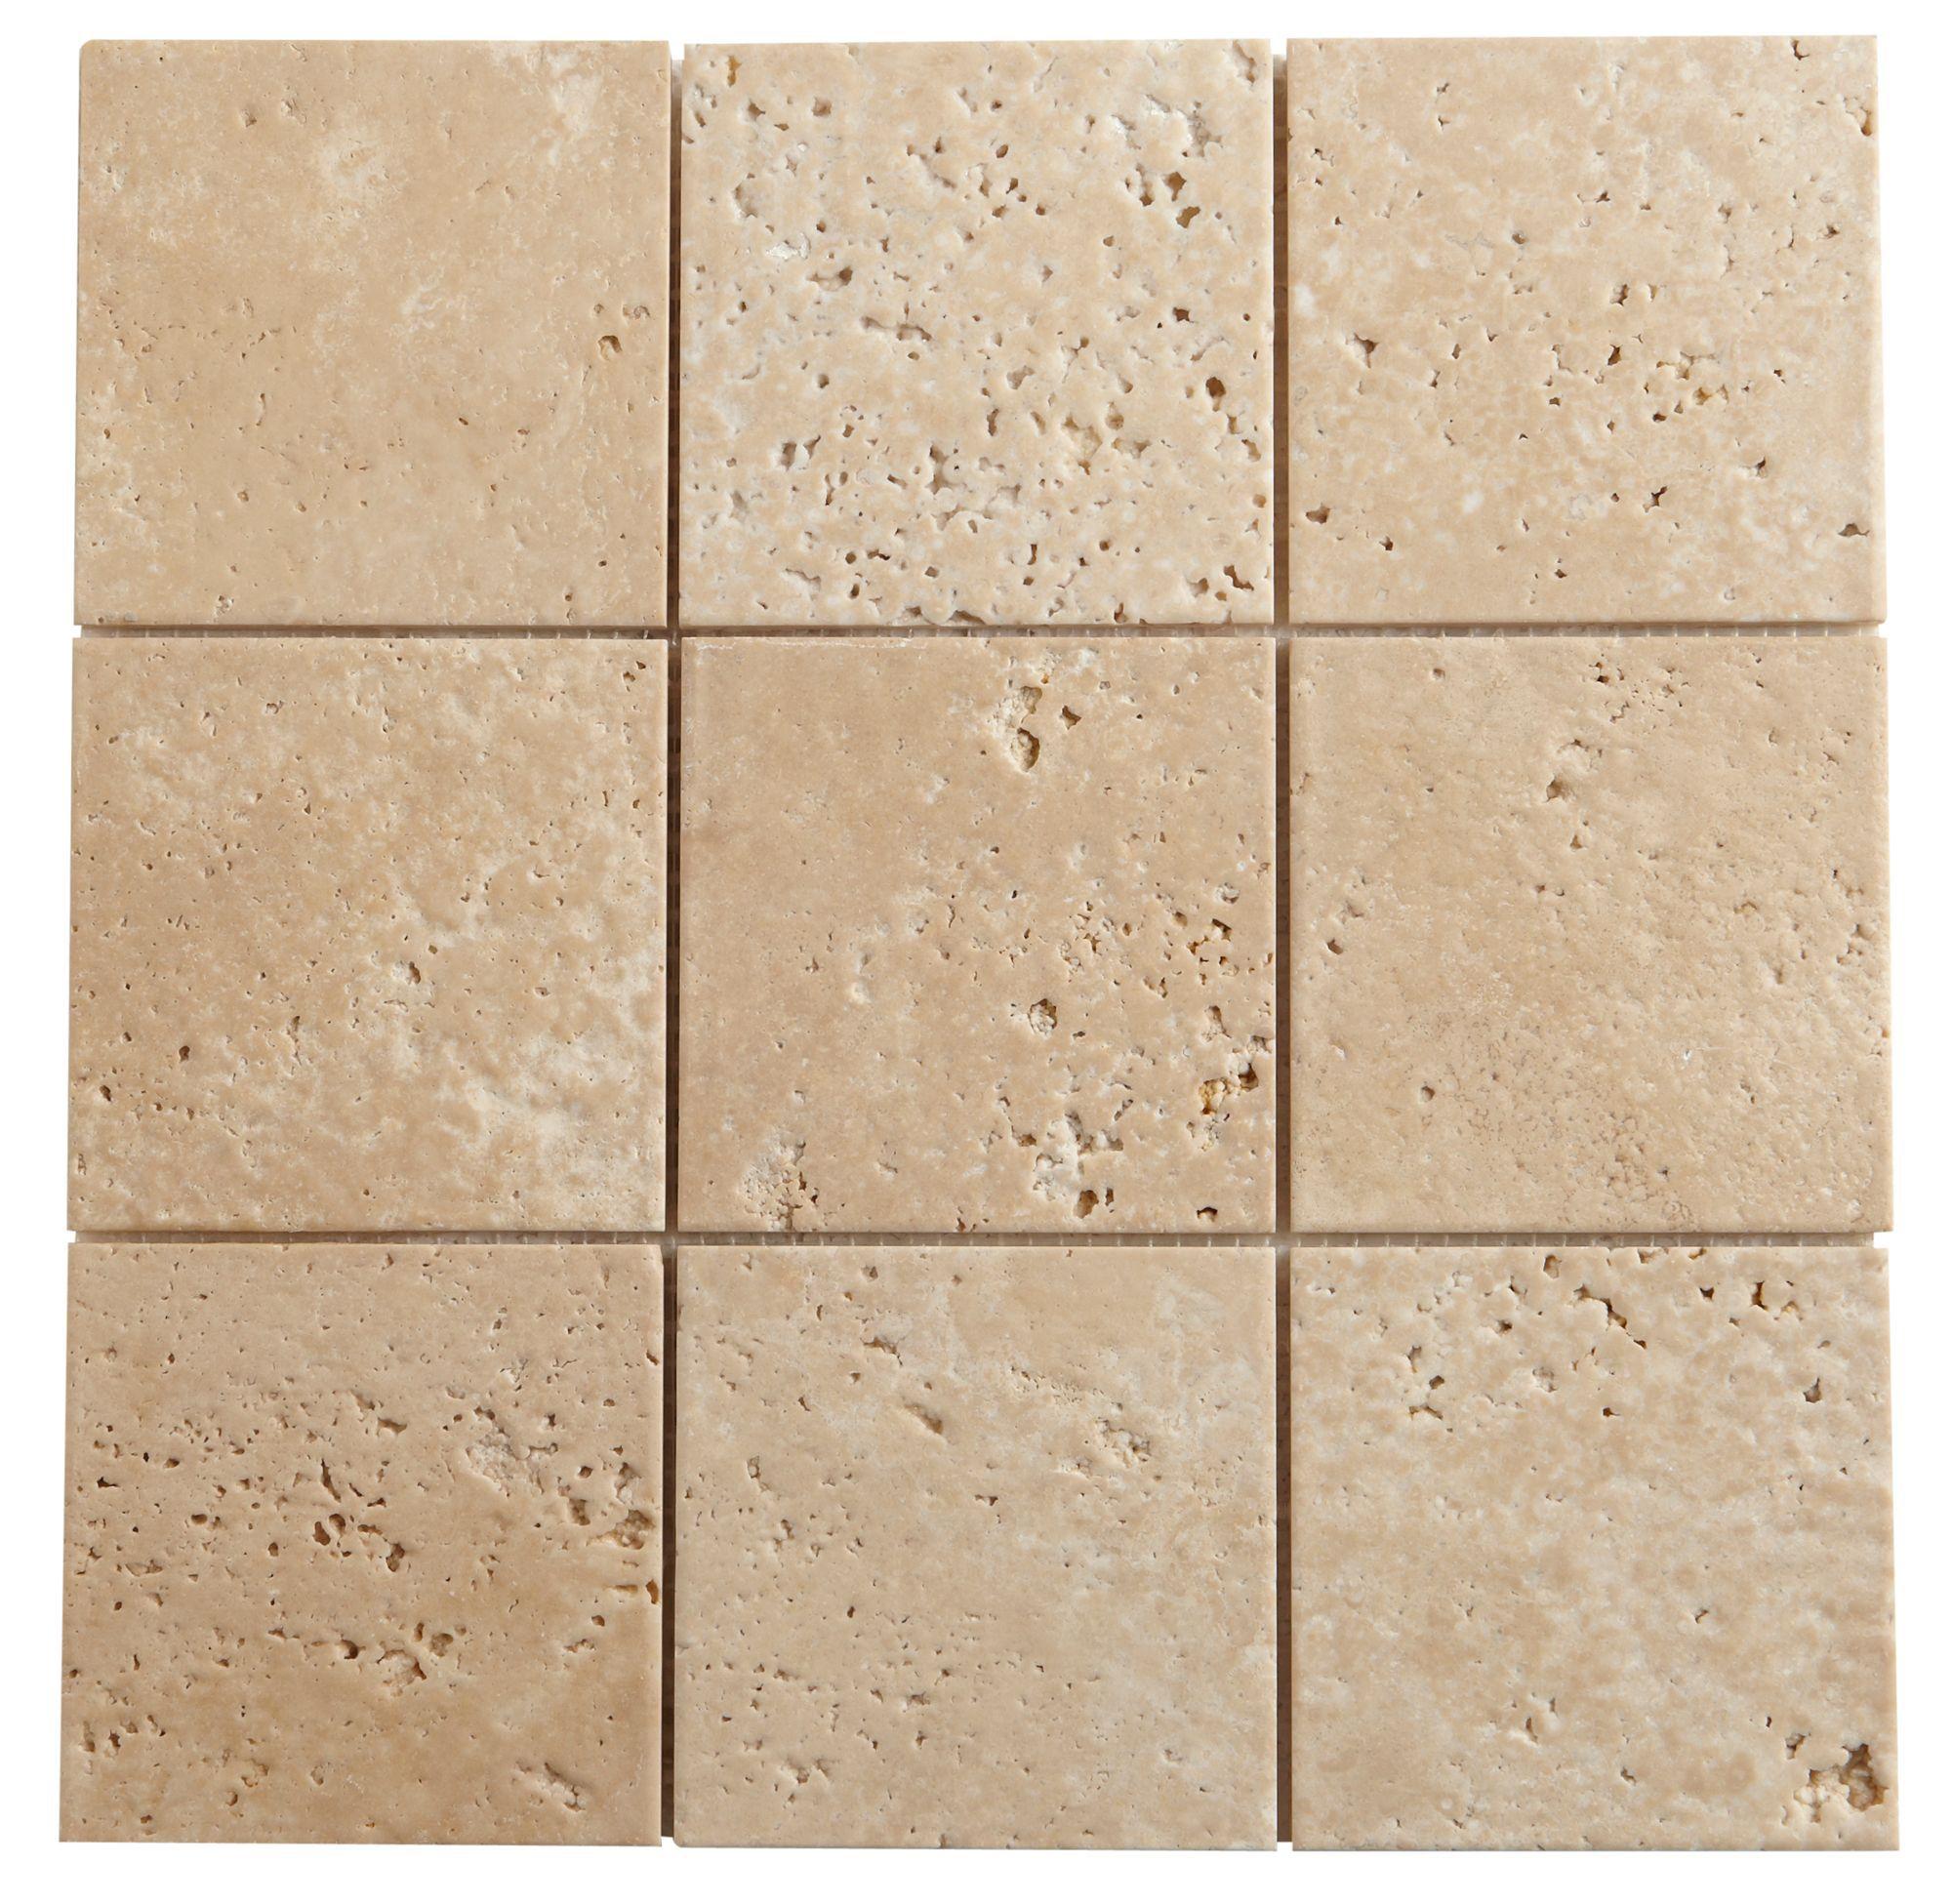 Natural Travertine Mosaic Tile L 300mm W 300mm: Beige Mosaic Travertine Mosaic Tile, (L)300mm (W)300mm